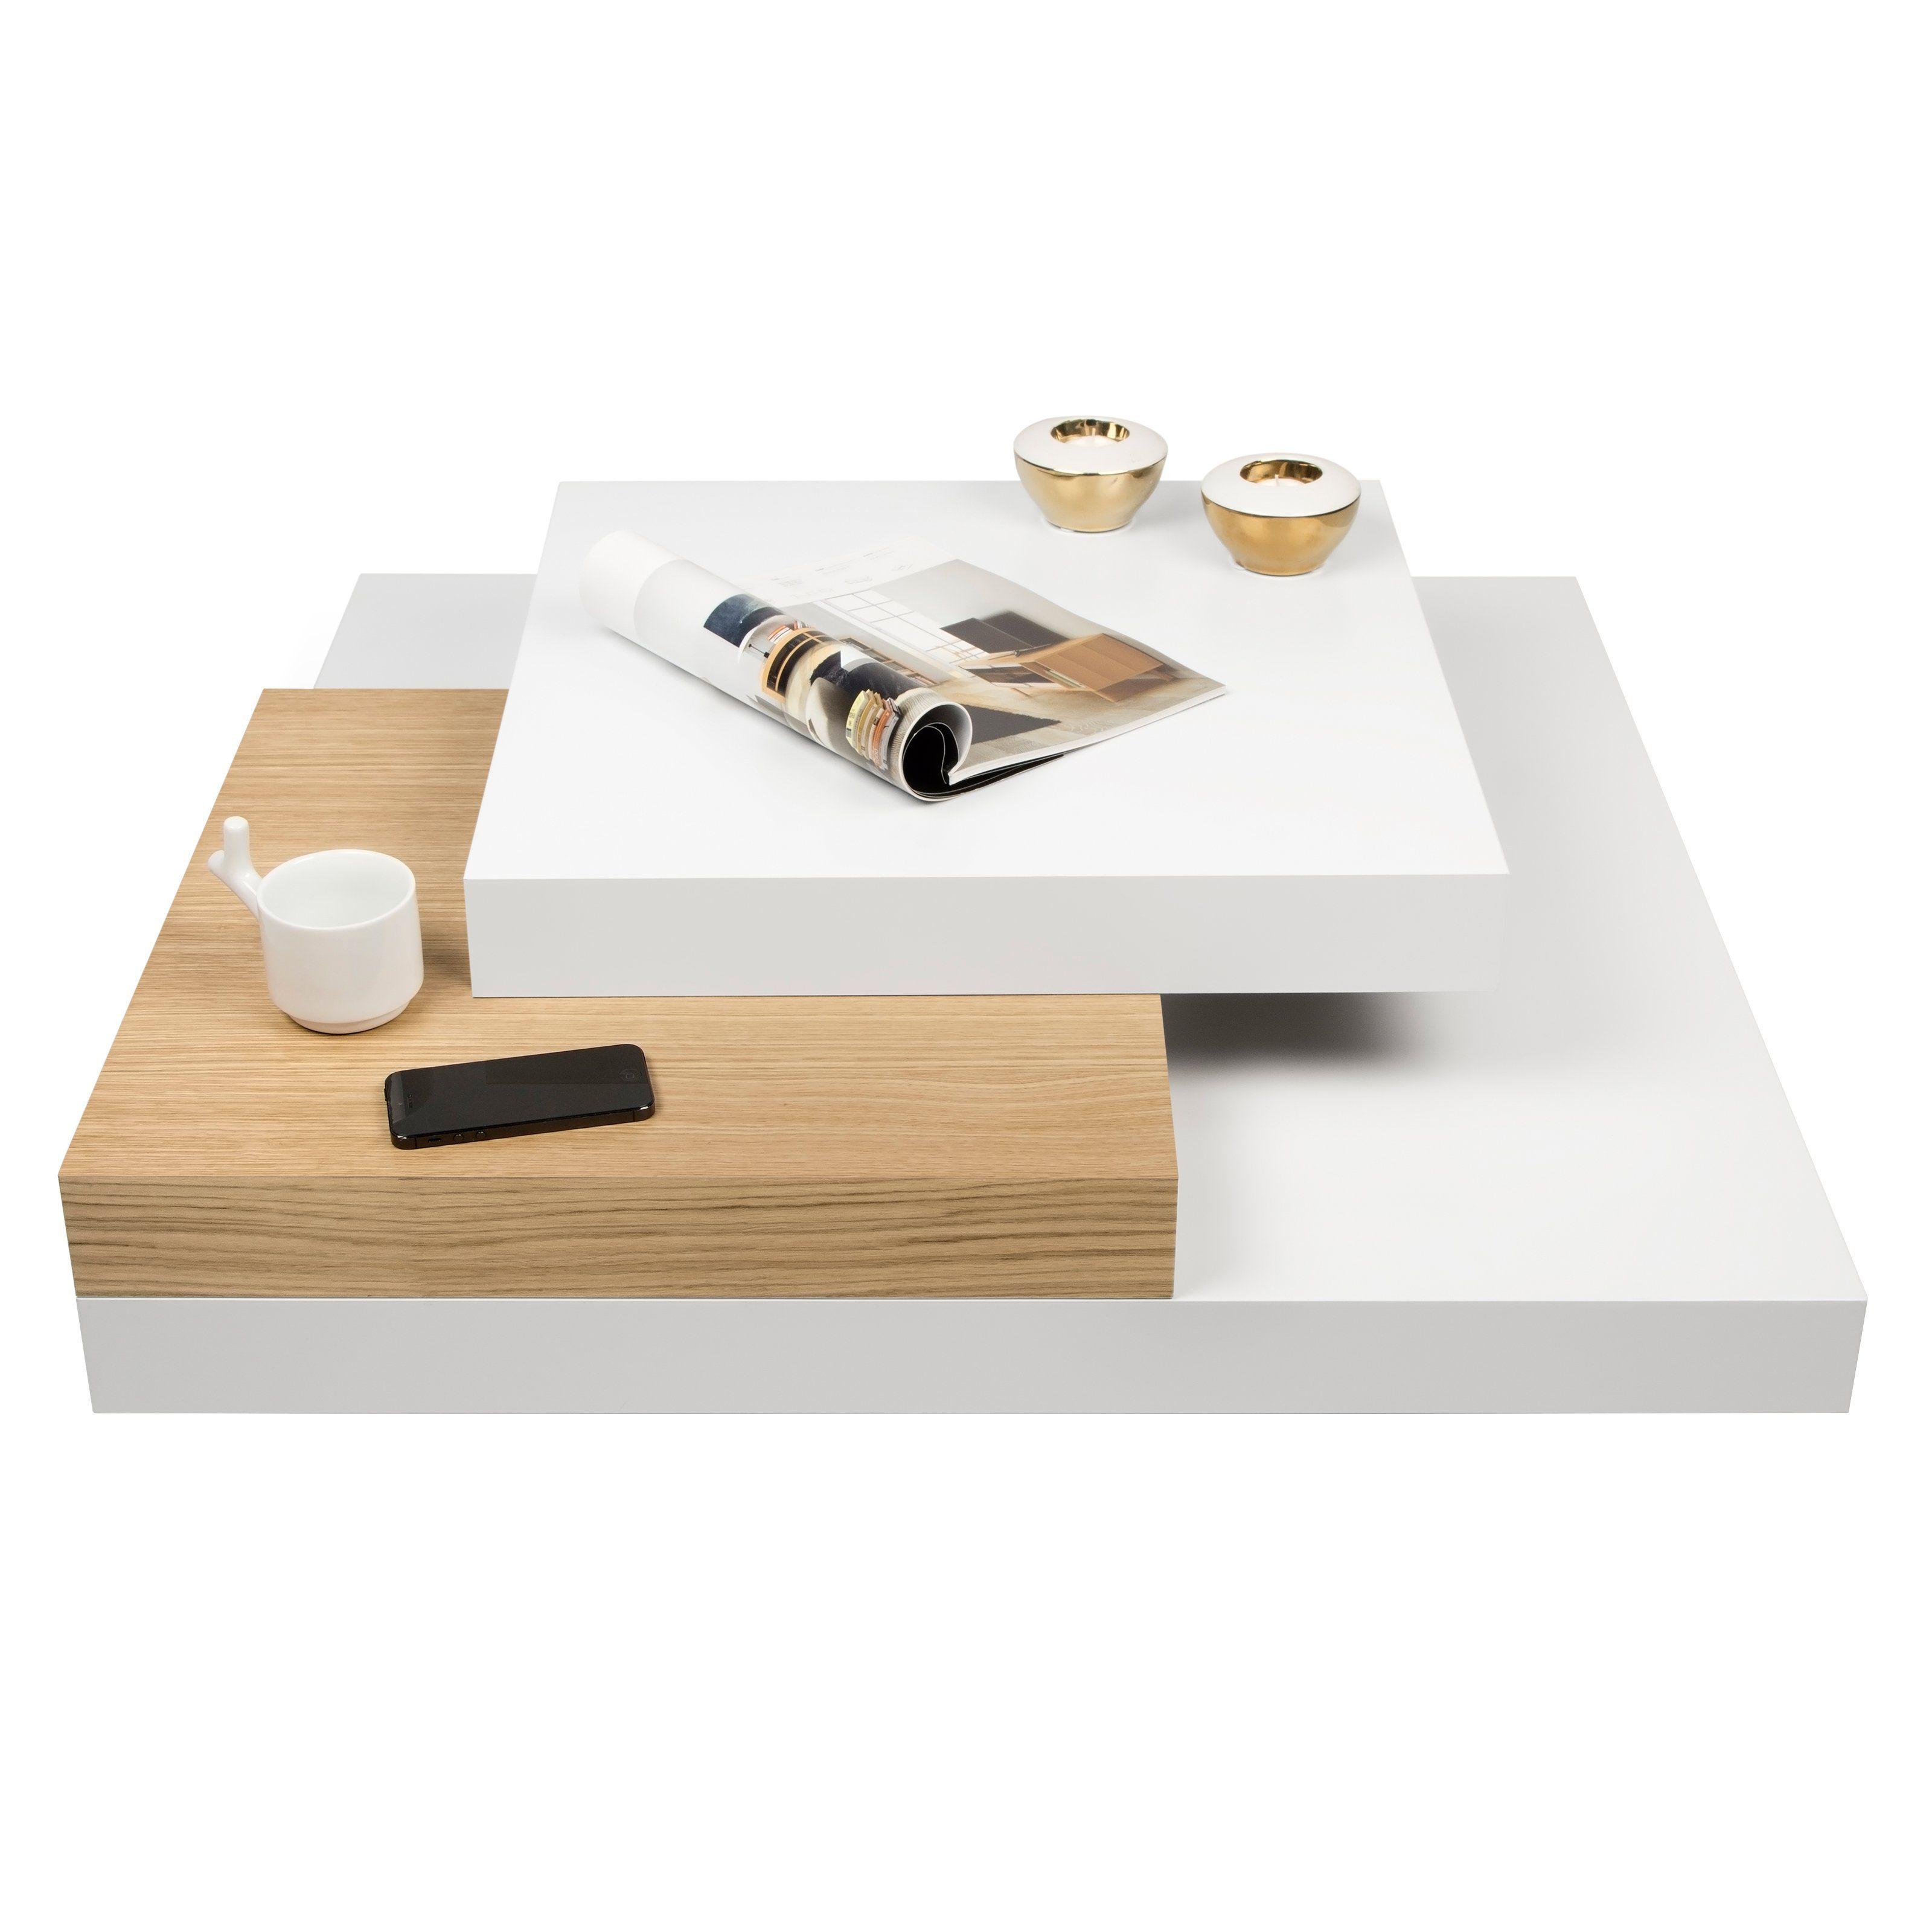 tema furniture slate coffee table    products  pinterest - tema furniture slate coffee table